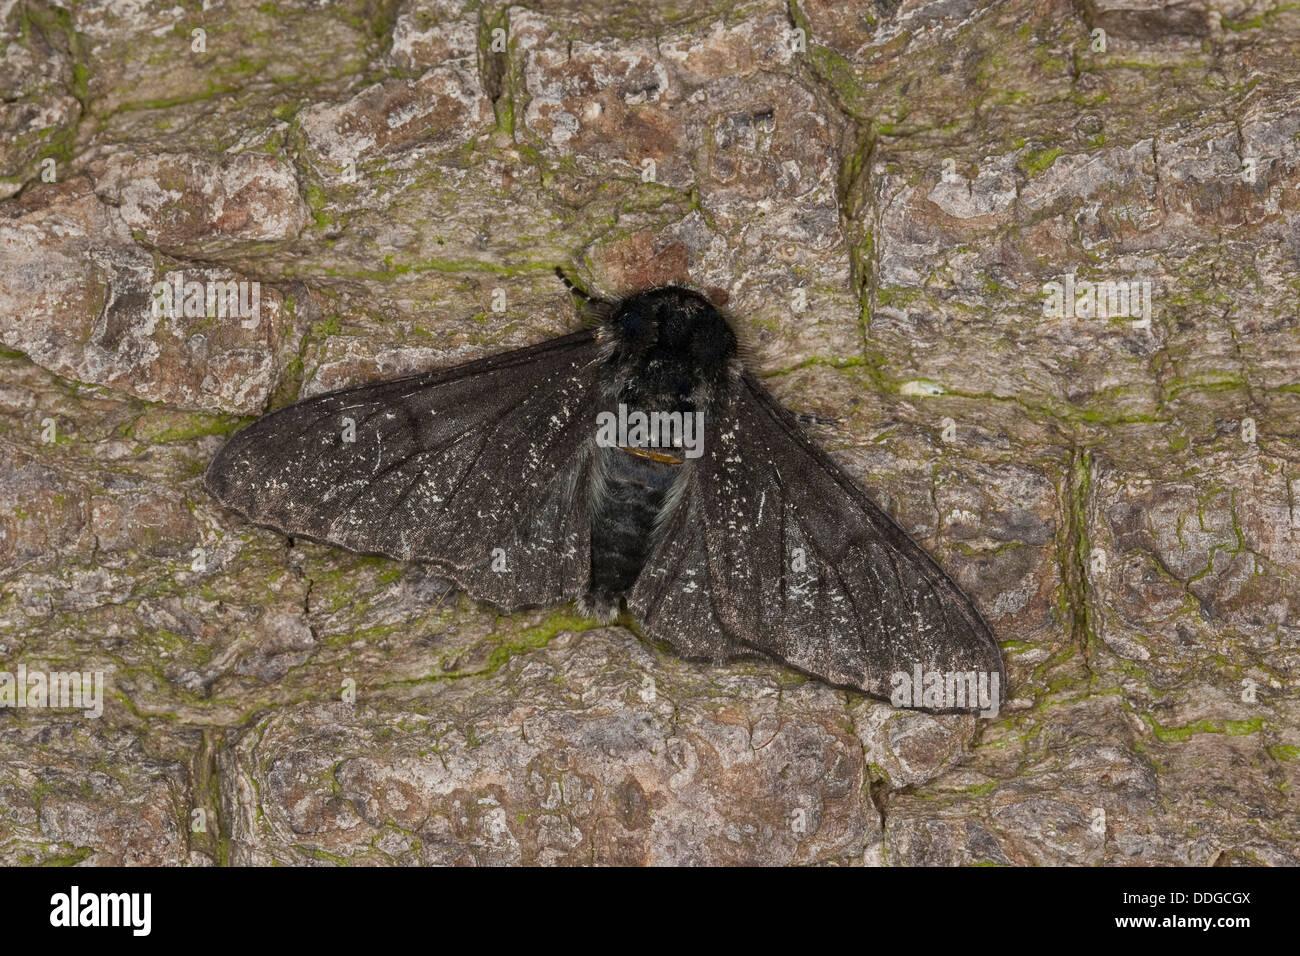 Peppered moth, Birkenspanner, Birken-Spanner, Biston betularia f. carbonaria, Biston betularius, Amphidasis betularia, - Stock Image